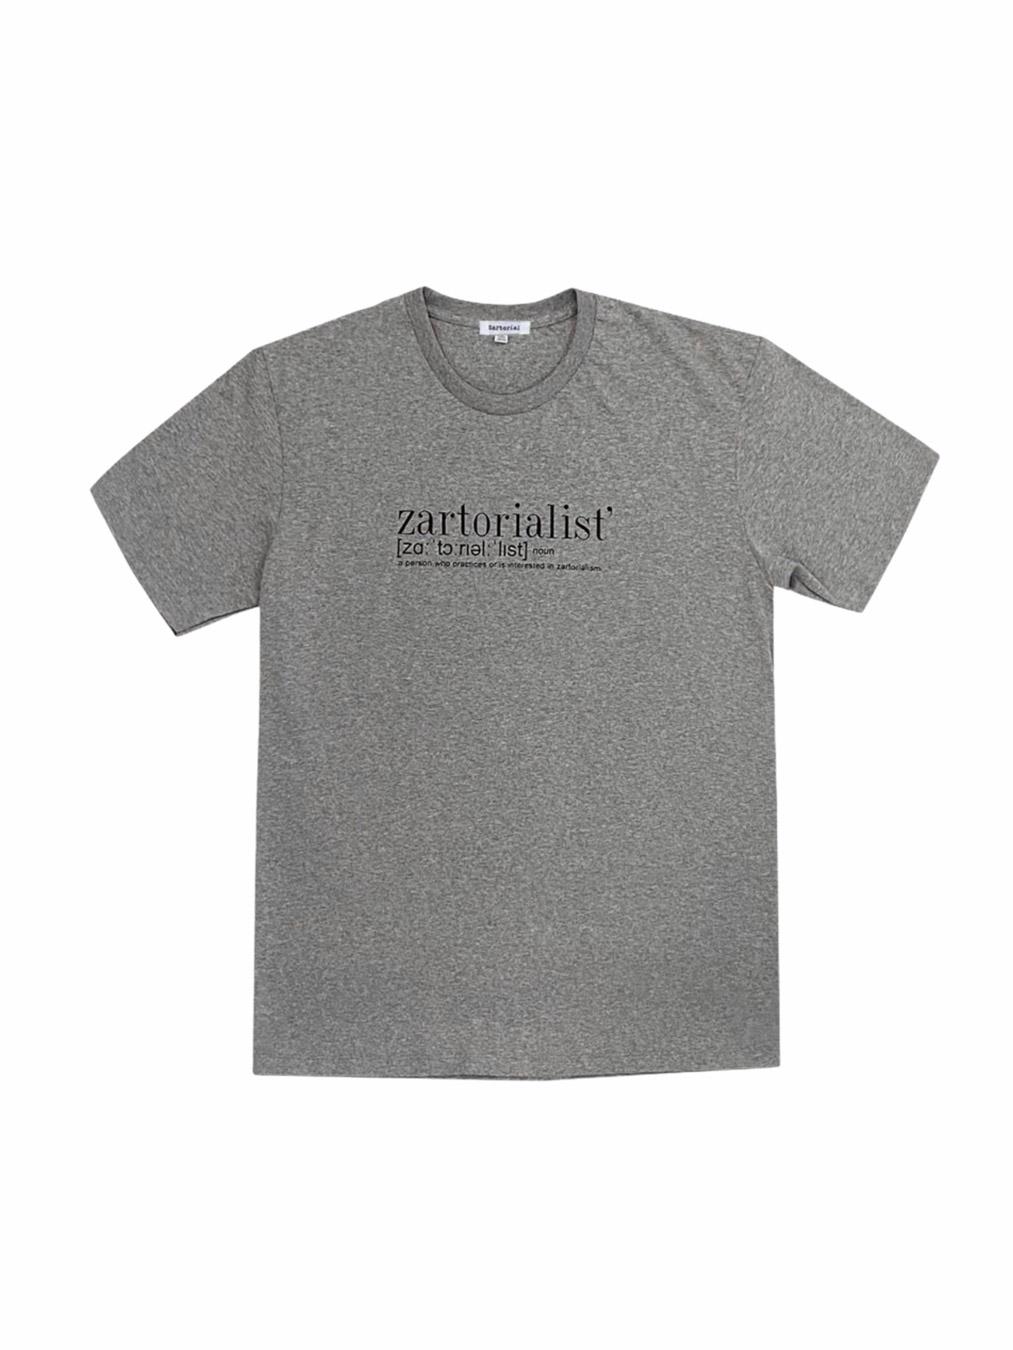 Zartorialist T-Shirt (Grey)